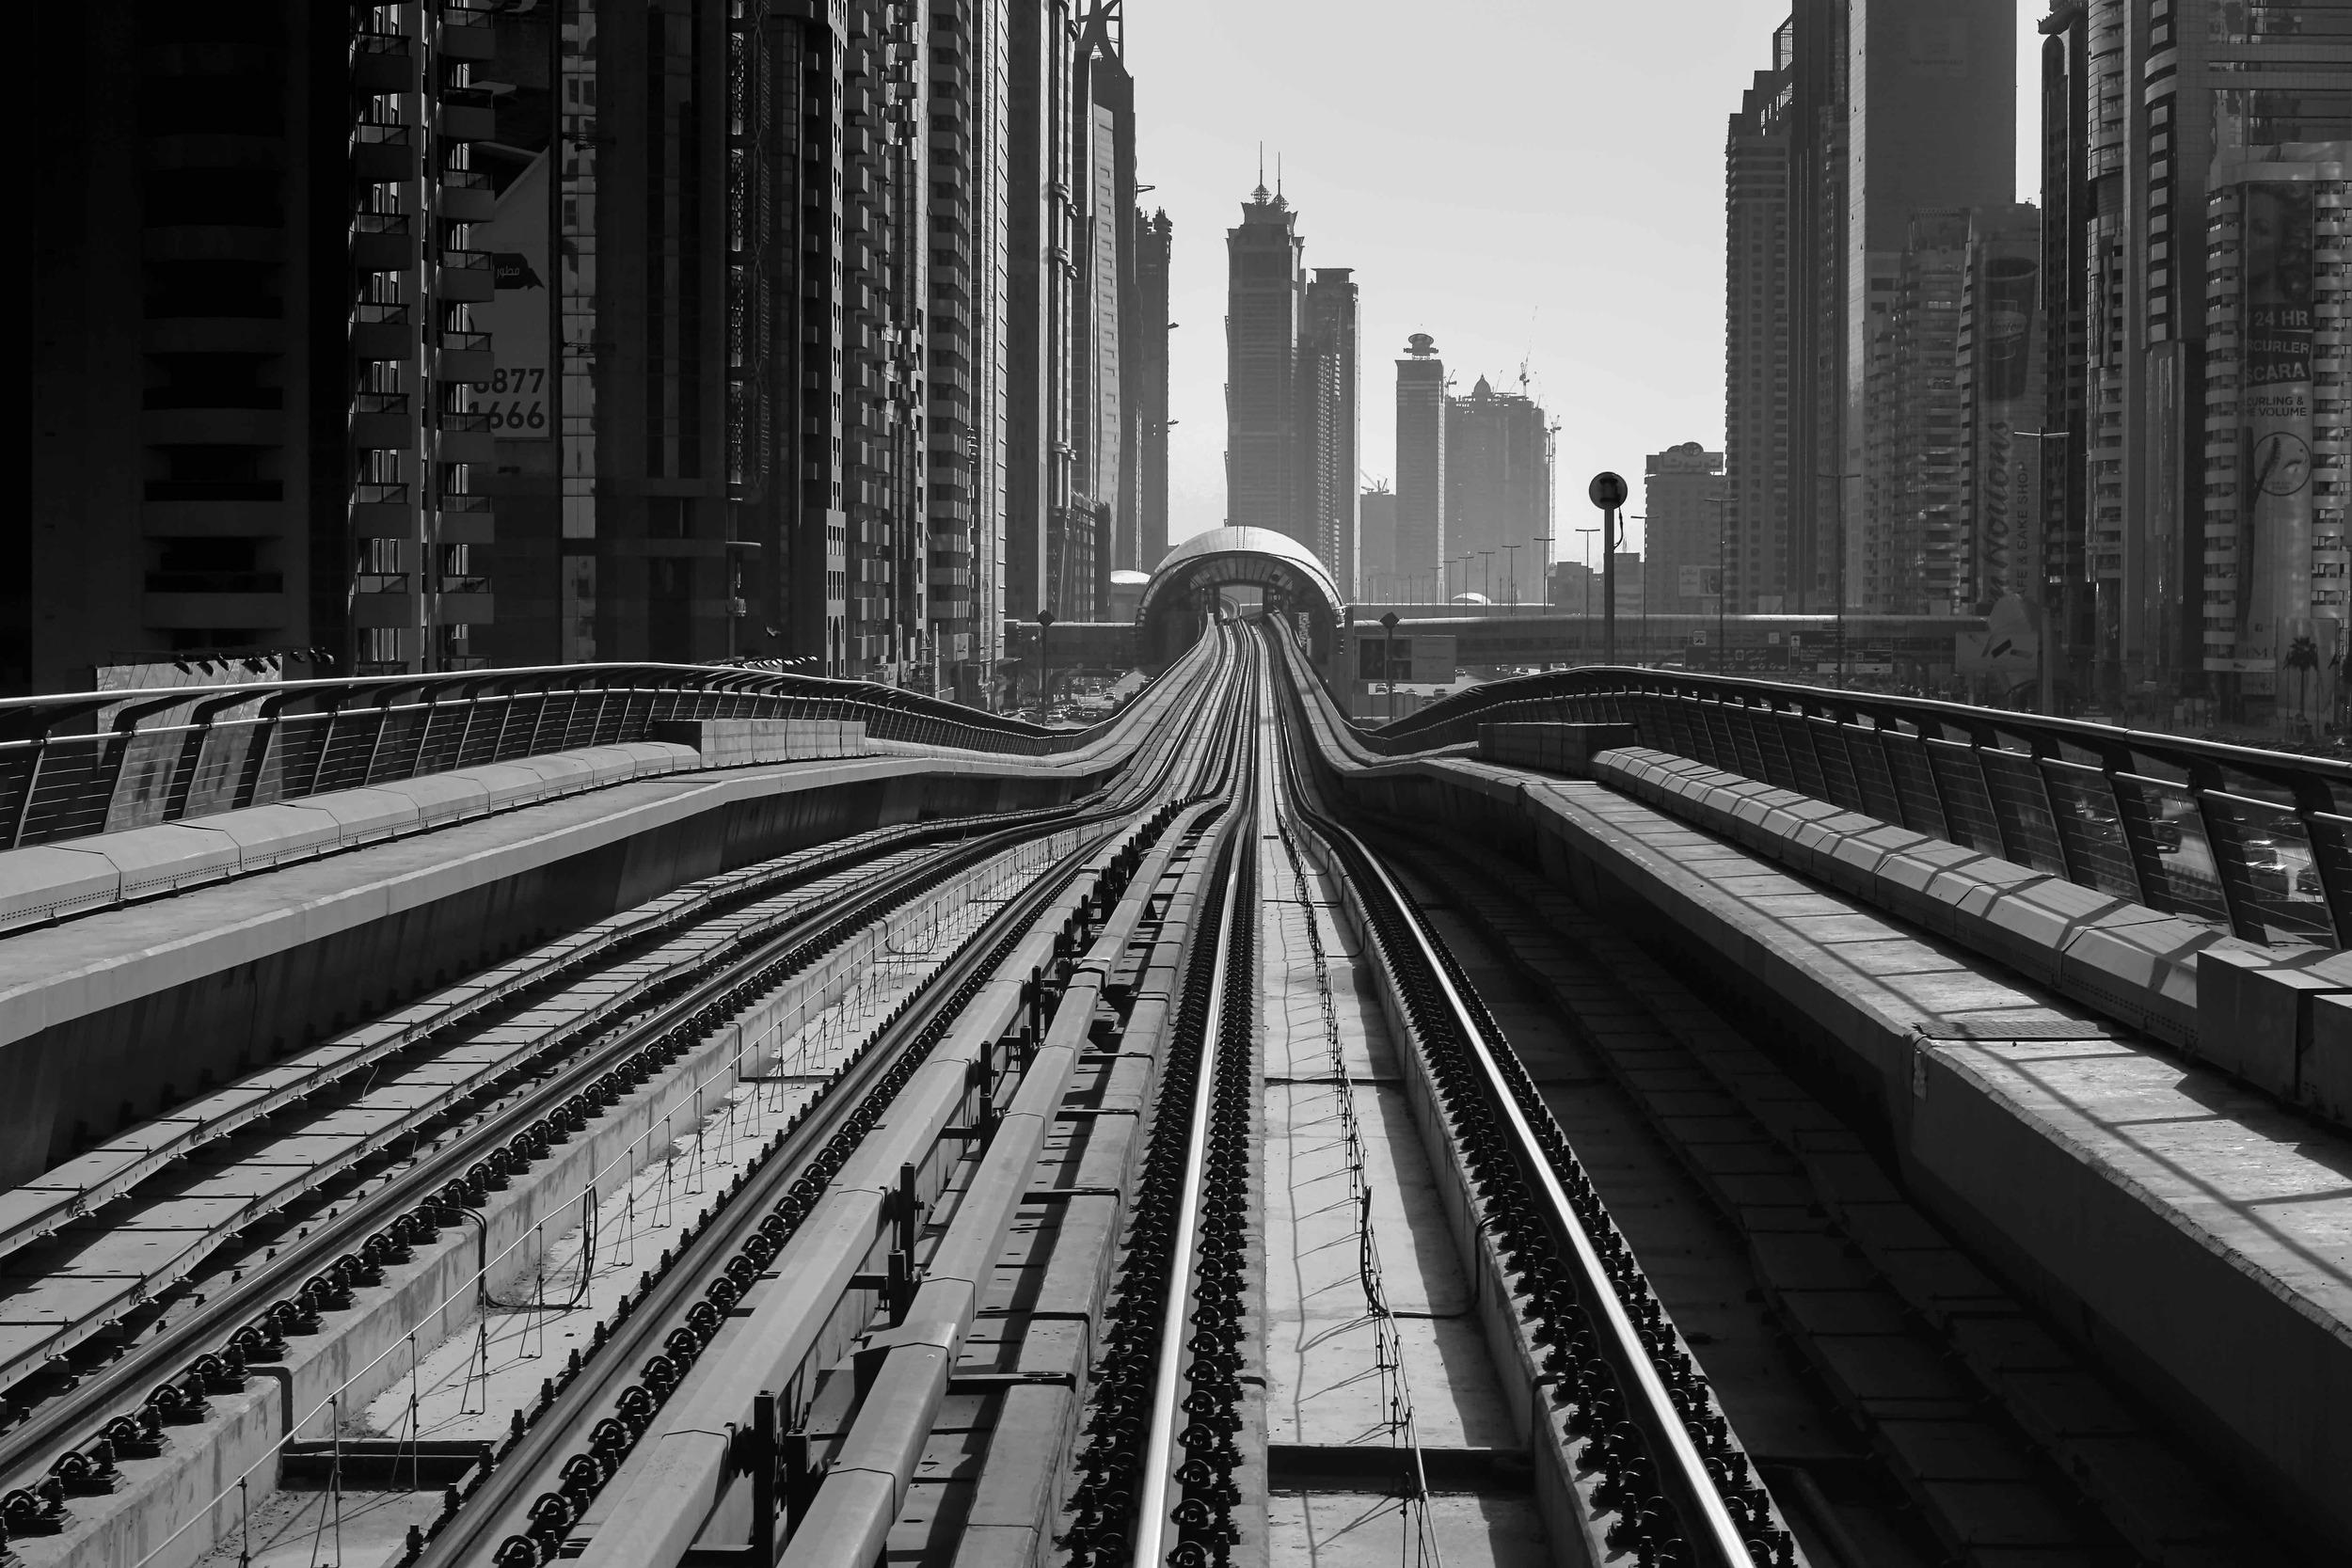 yuri torres photography   SIGHTSOULS BLOG   DUBAI Metro Skyscrapers Grey Black and White.jpg